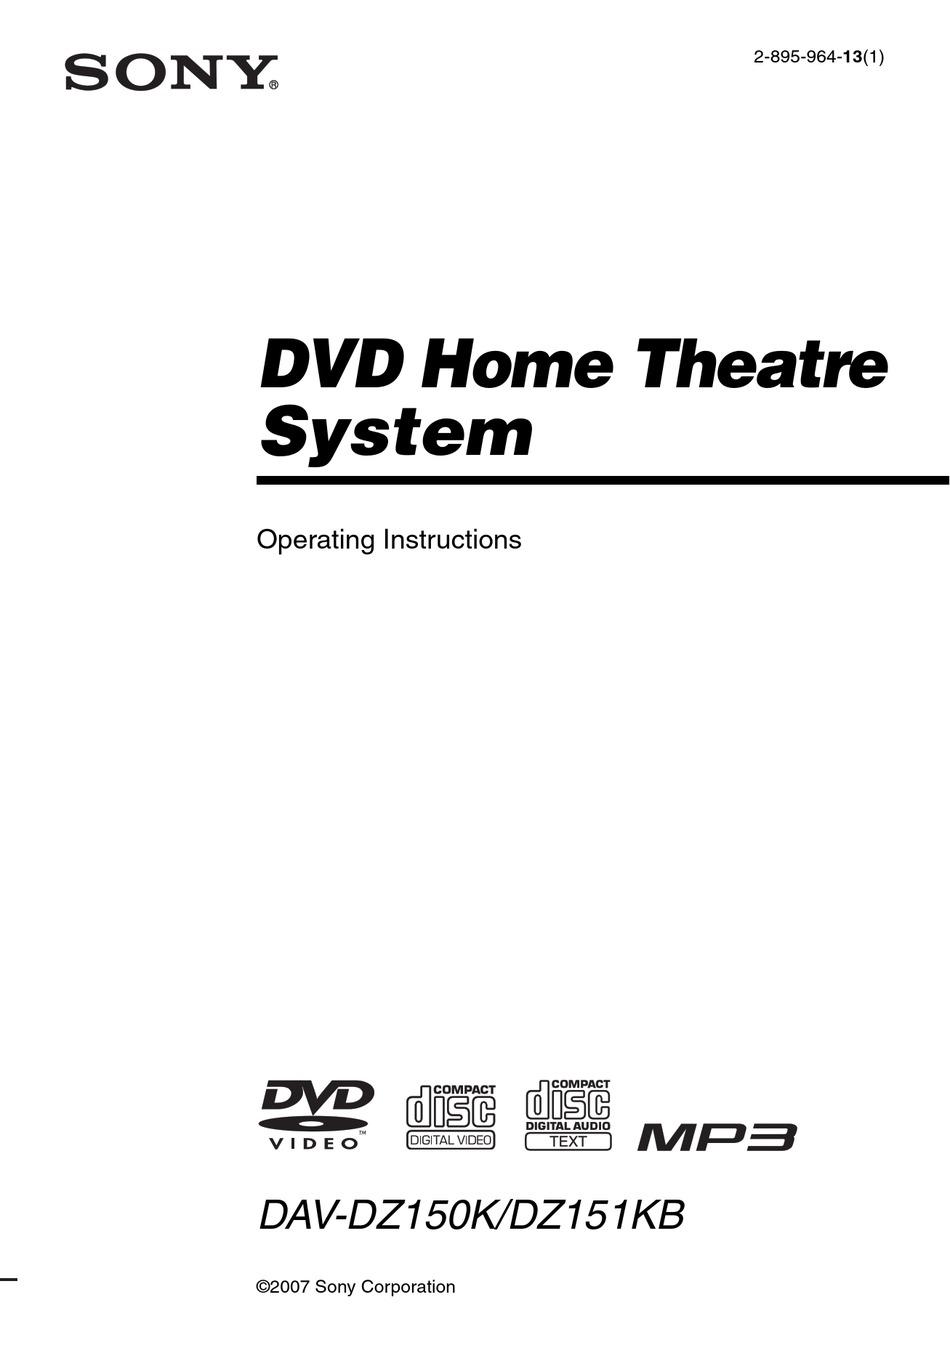 SONY DAV-DZ150K OPERATING INSTRUCTIONS MANUAL Pdf Download